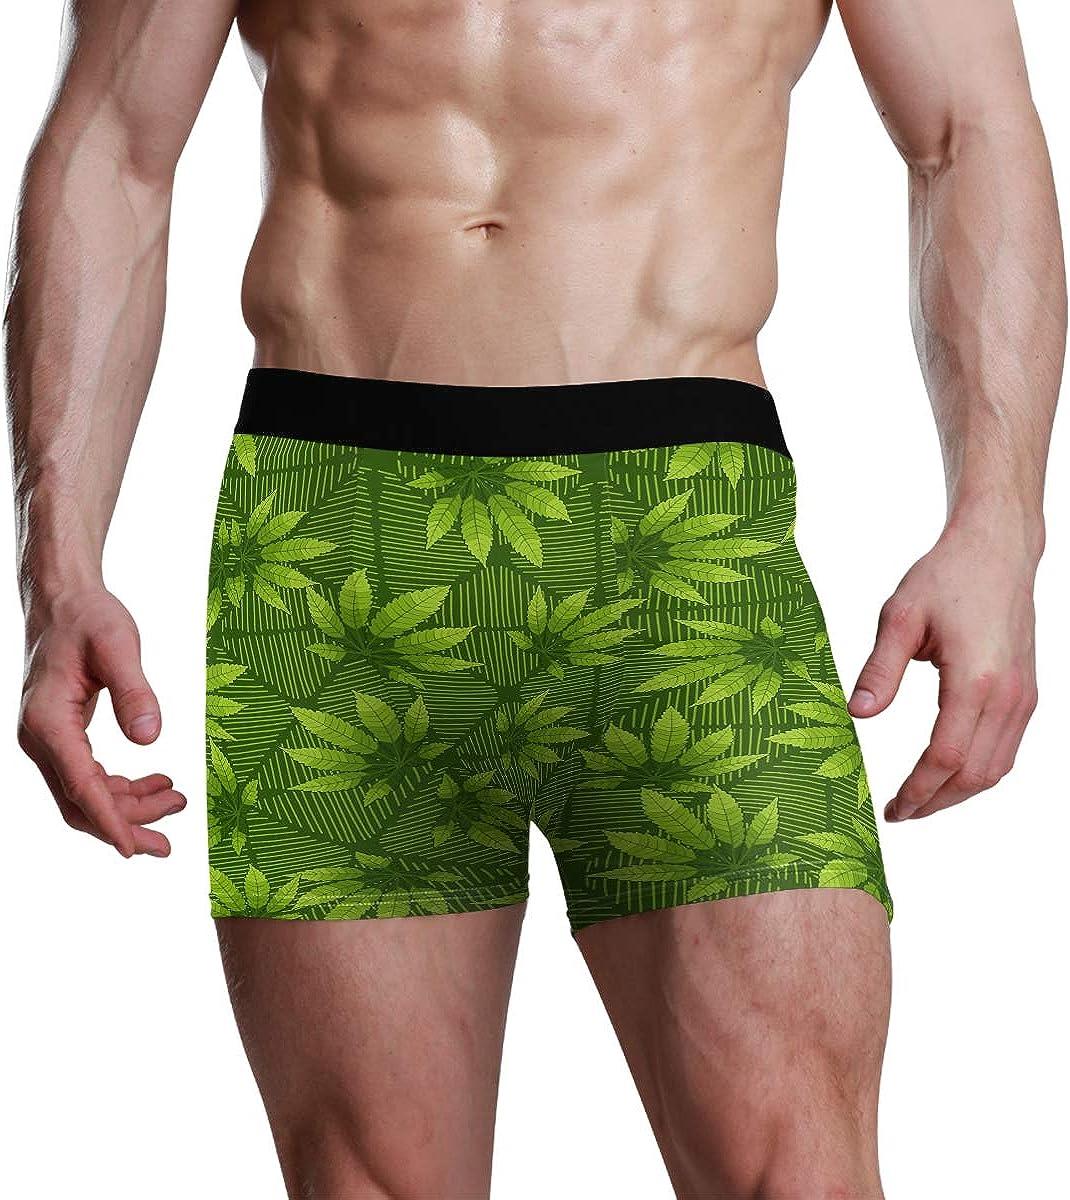 HangWang Men's Boxer Briefs Green Leaves Background Bikini Underwear Stretch Trunks Boys Underpants